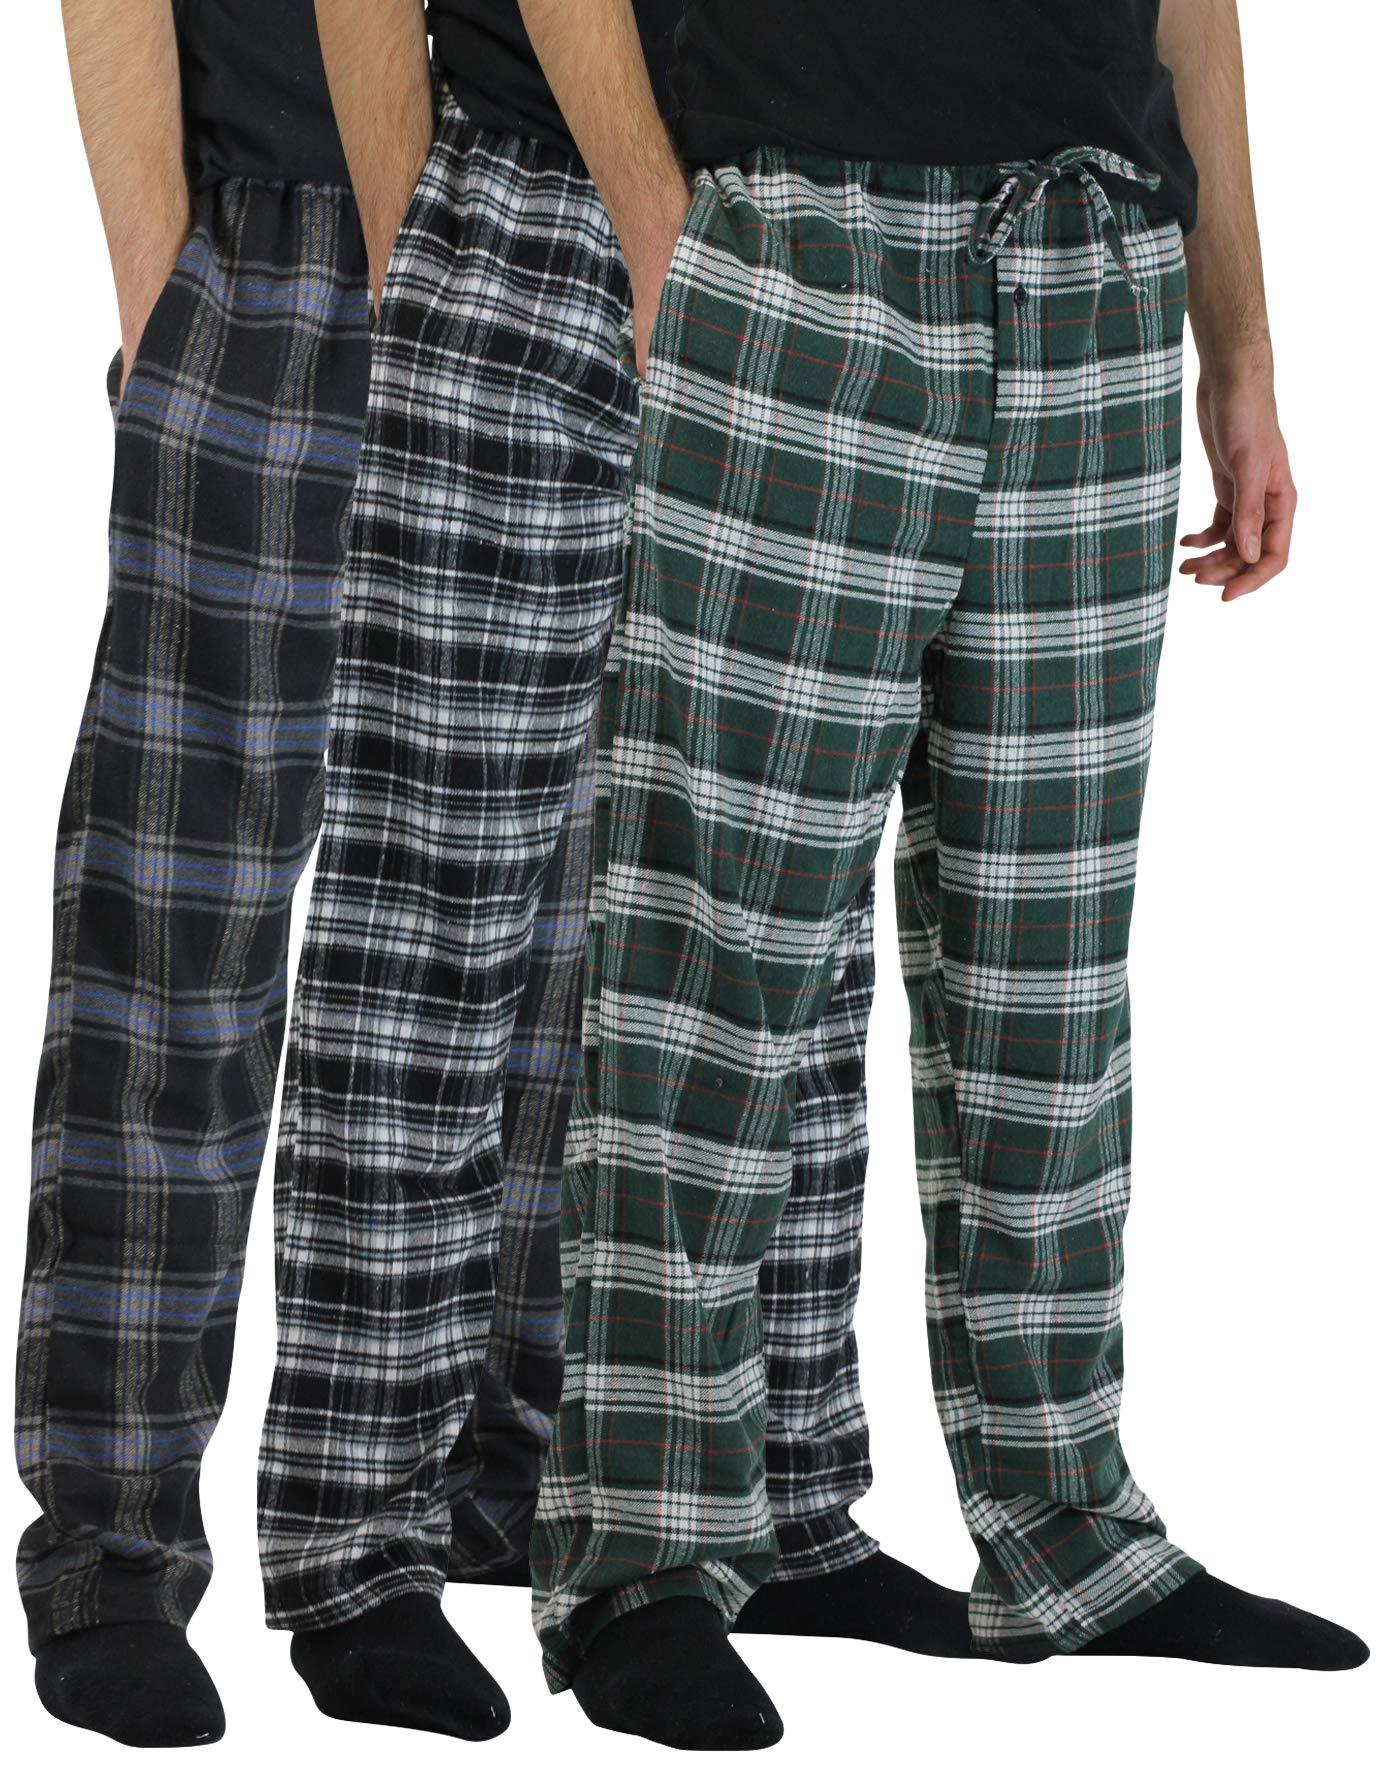 Real Essentials 3 Pack:Men's Cotton Super Soft Flannel Plaid Pajama Pants/Lounge Bottoms,Set 4-L by Real Essentials (Image #1)